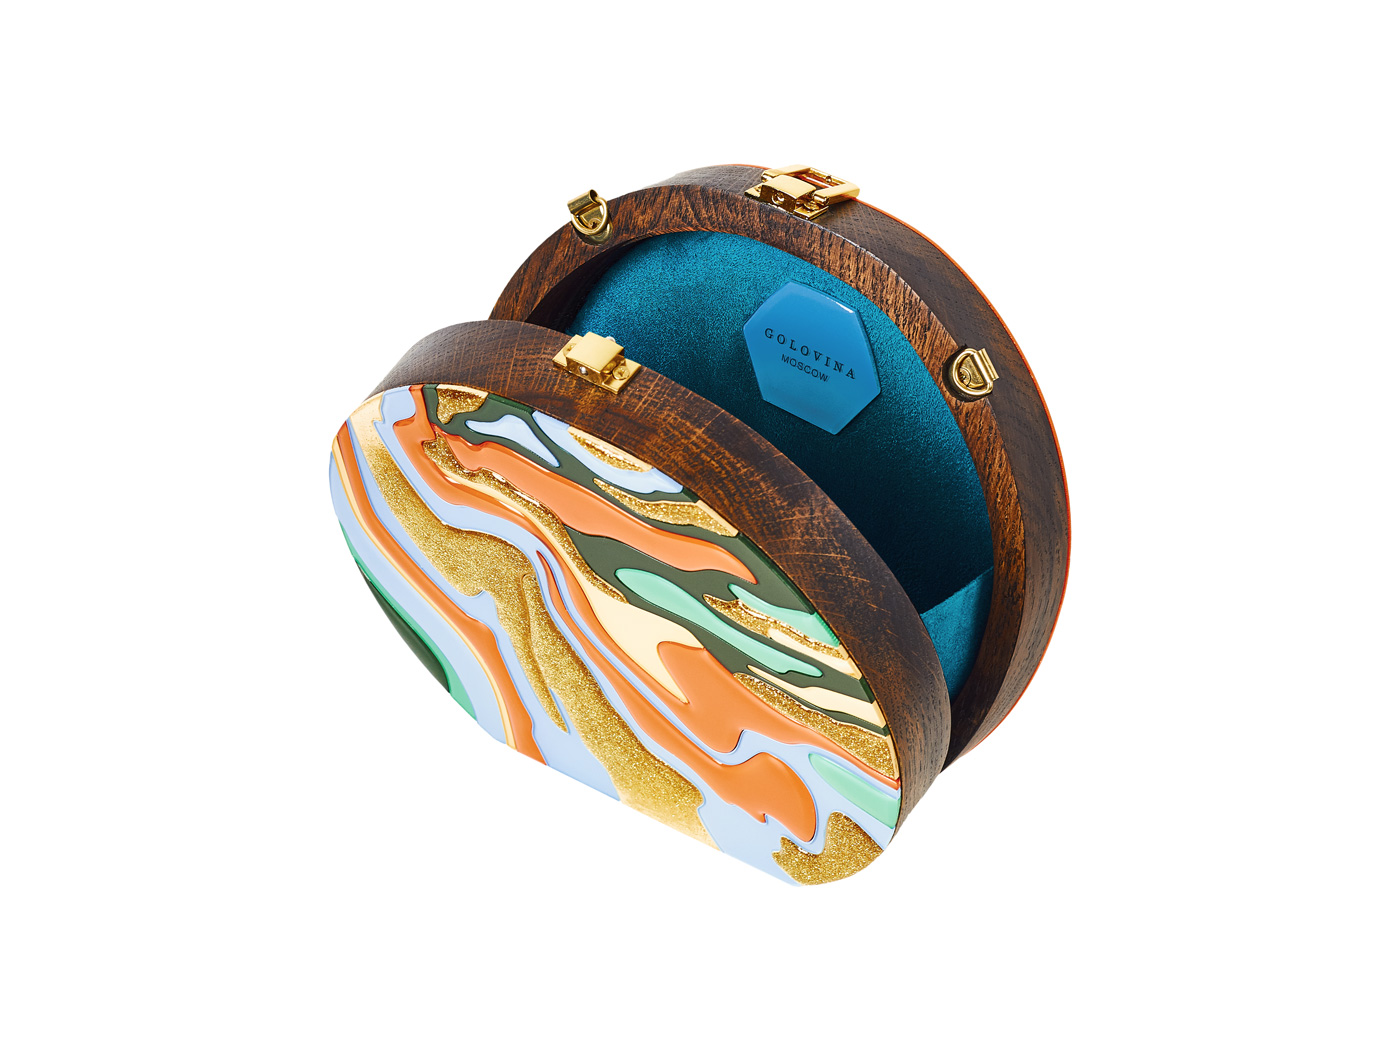 Golovina-marble-clutch-bag-orange-and-blue-5